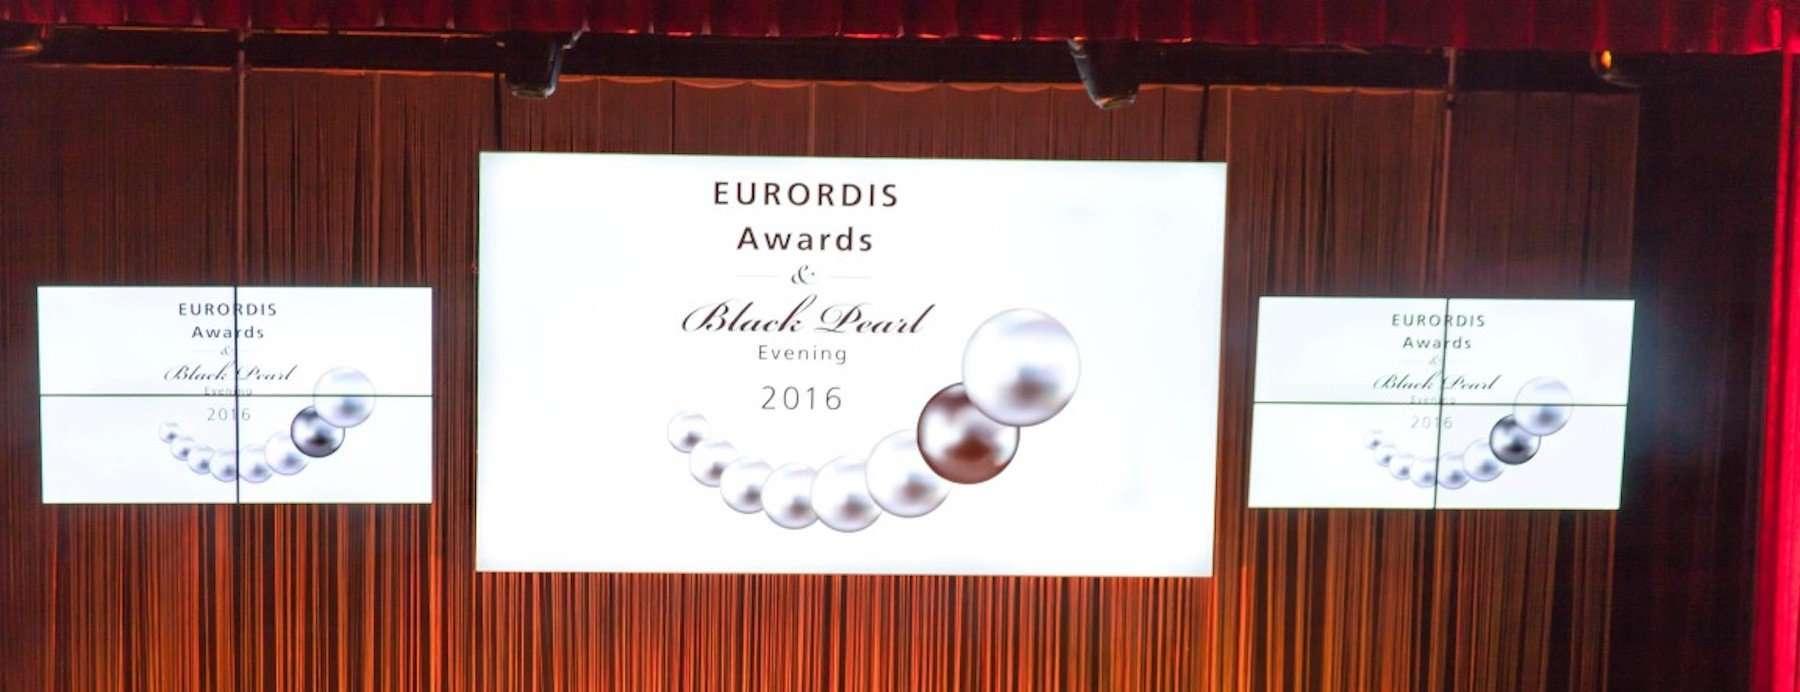 '5th EURORDIS Awards Ceremony'